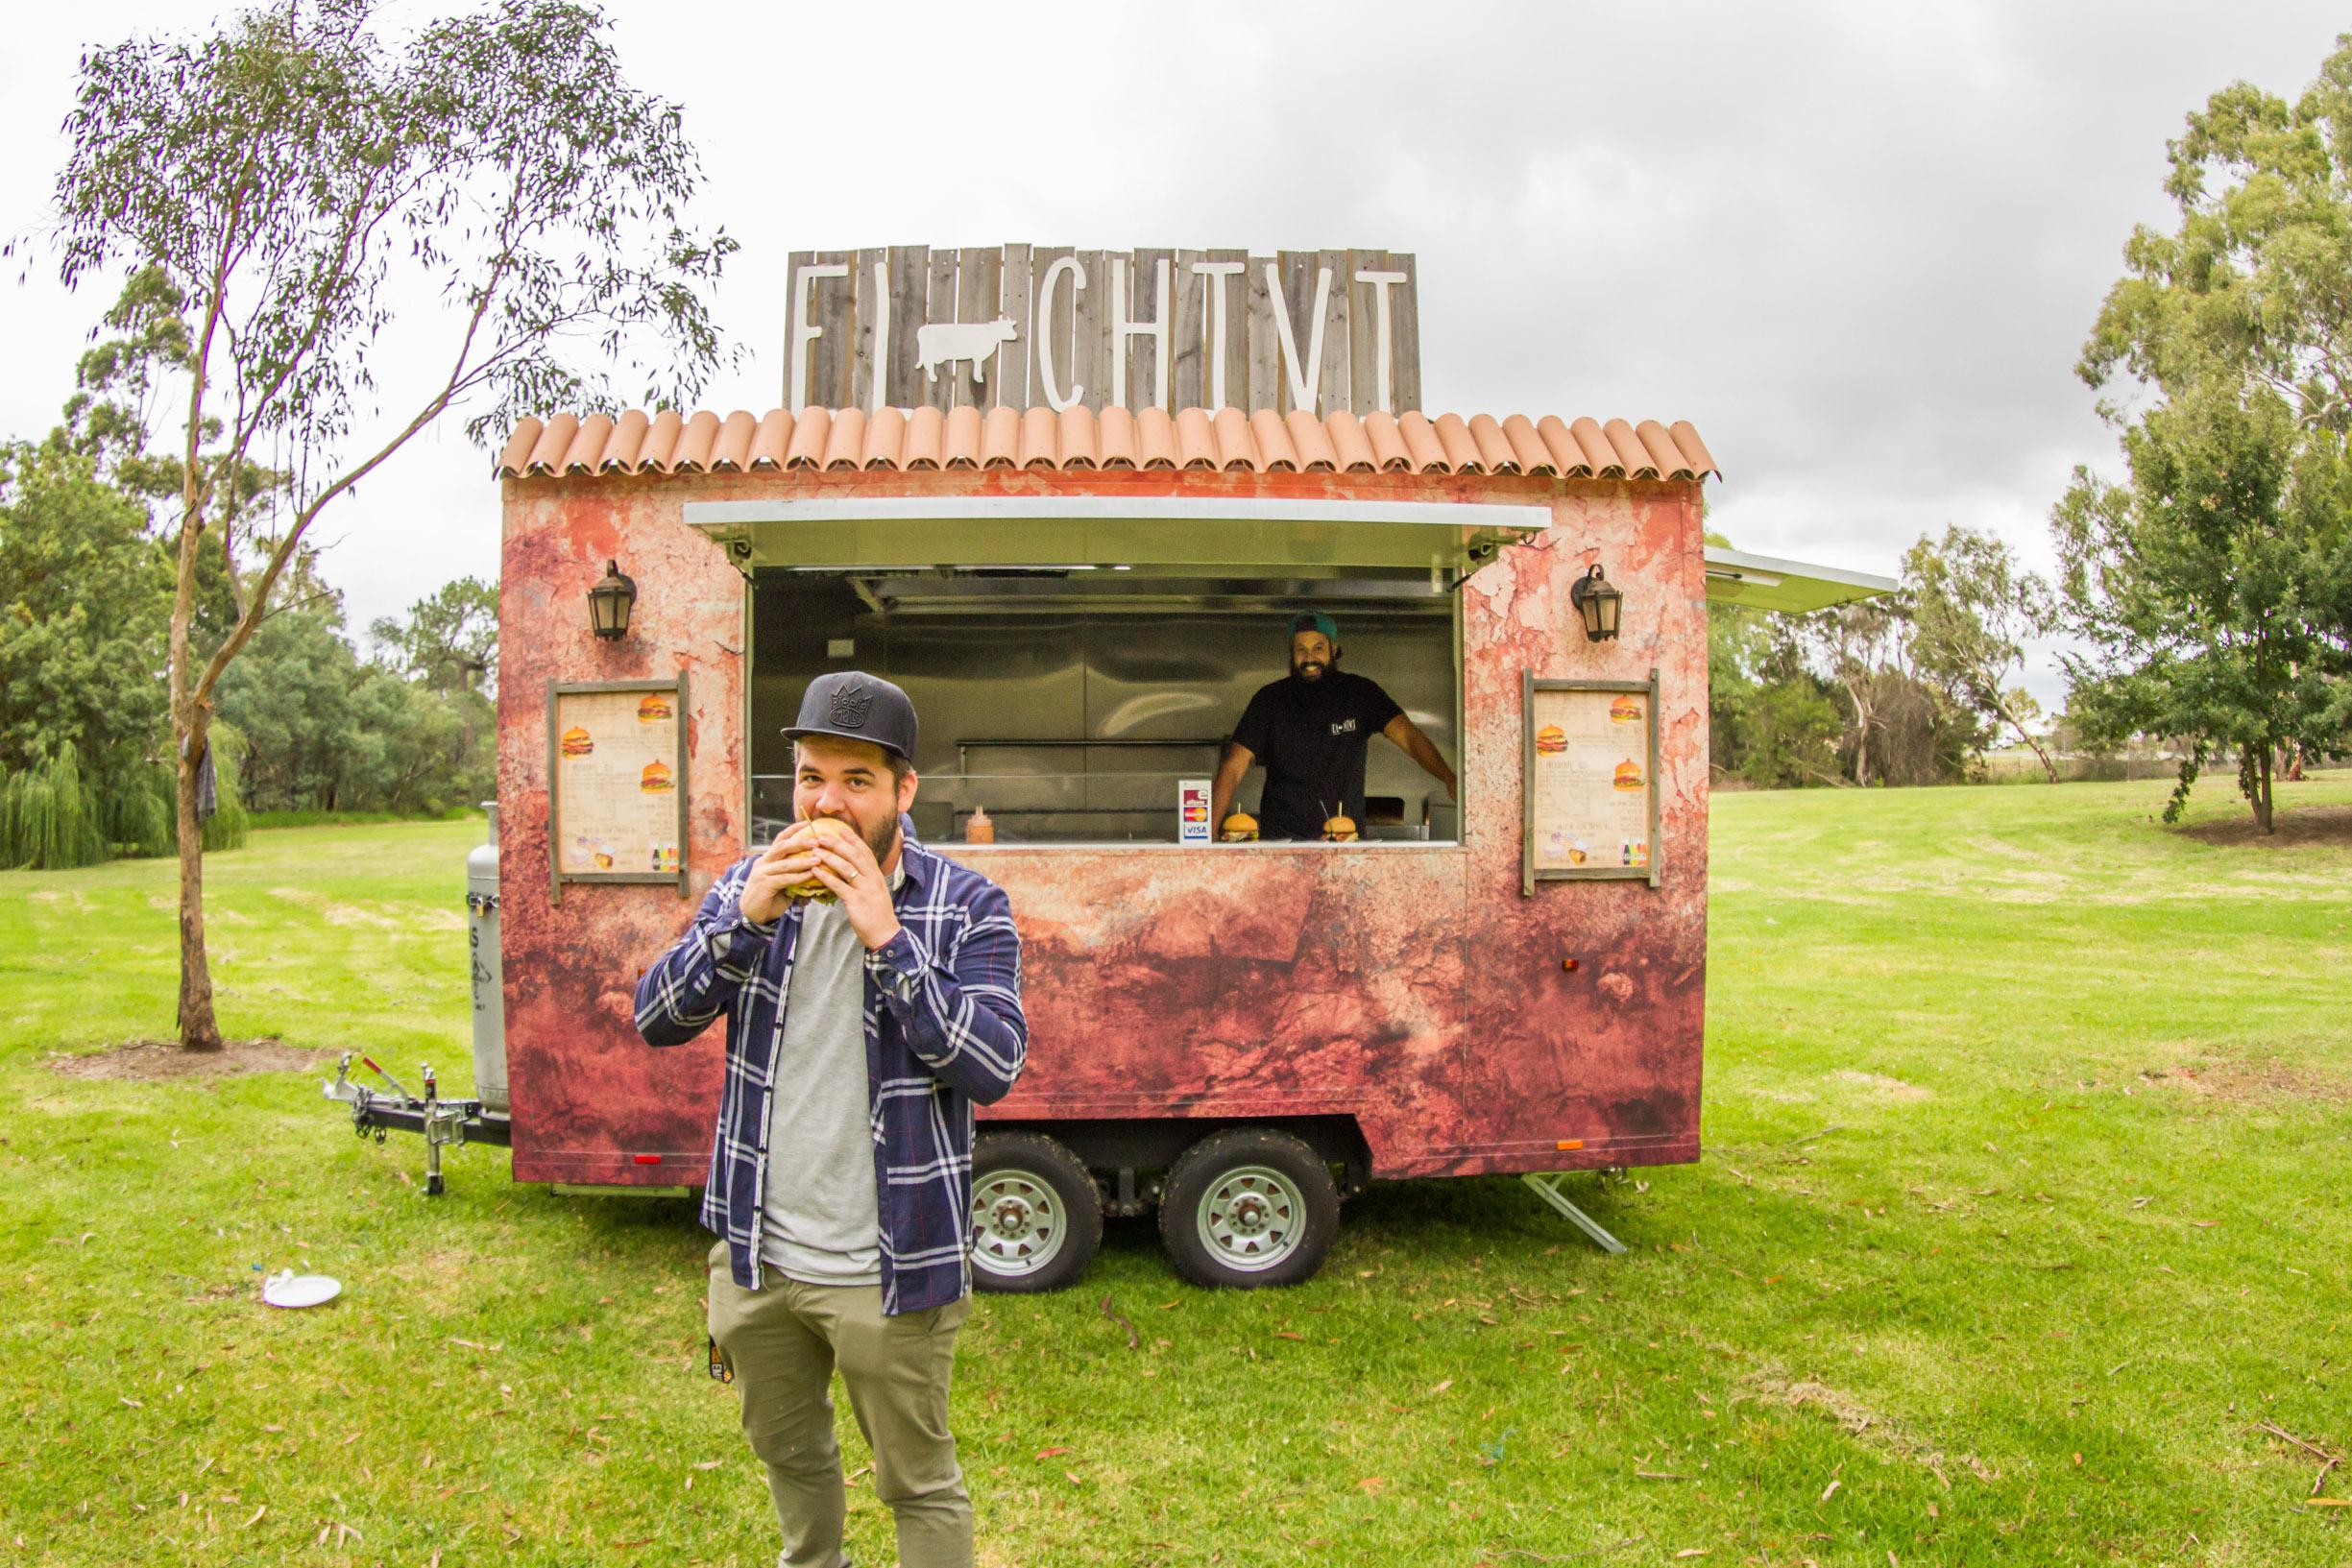 Food Truck Festival Melbourne